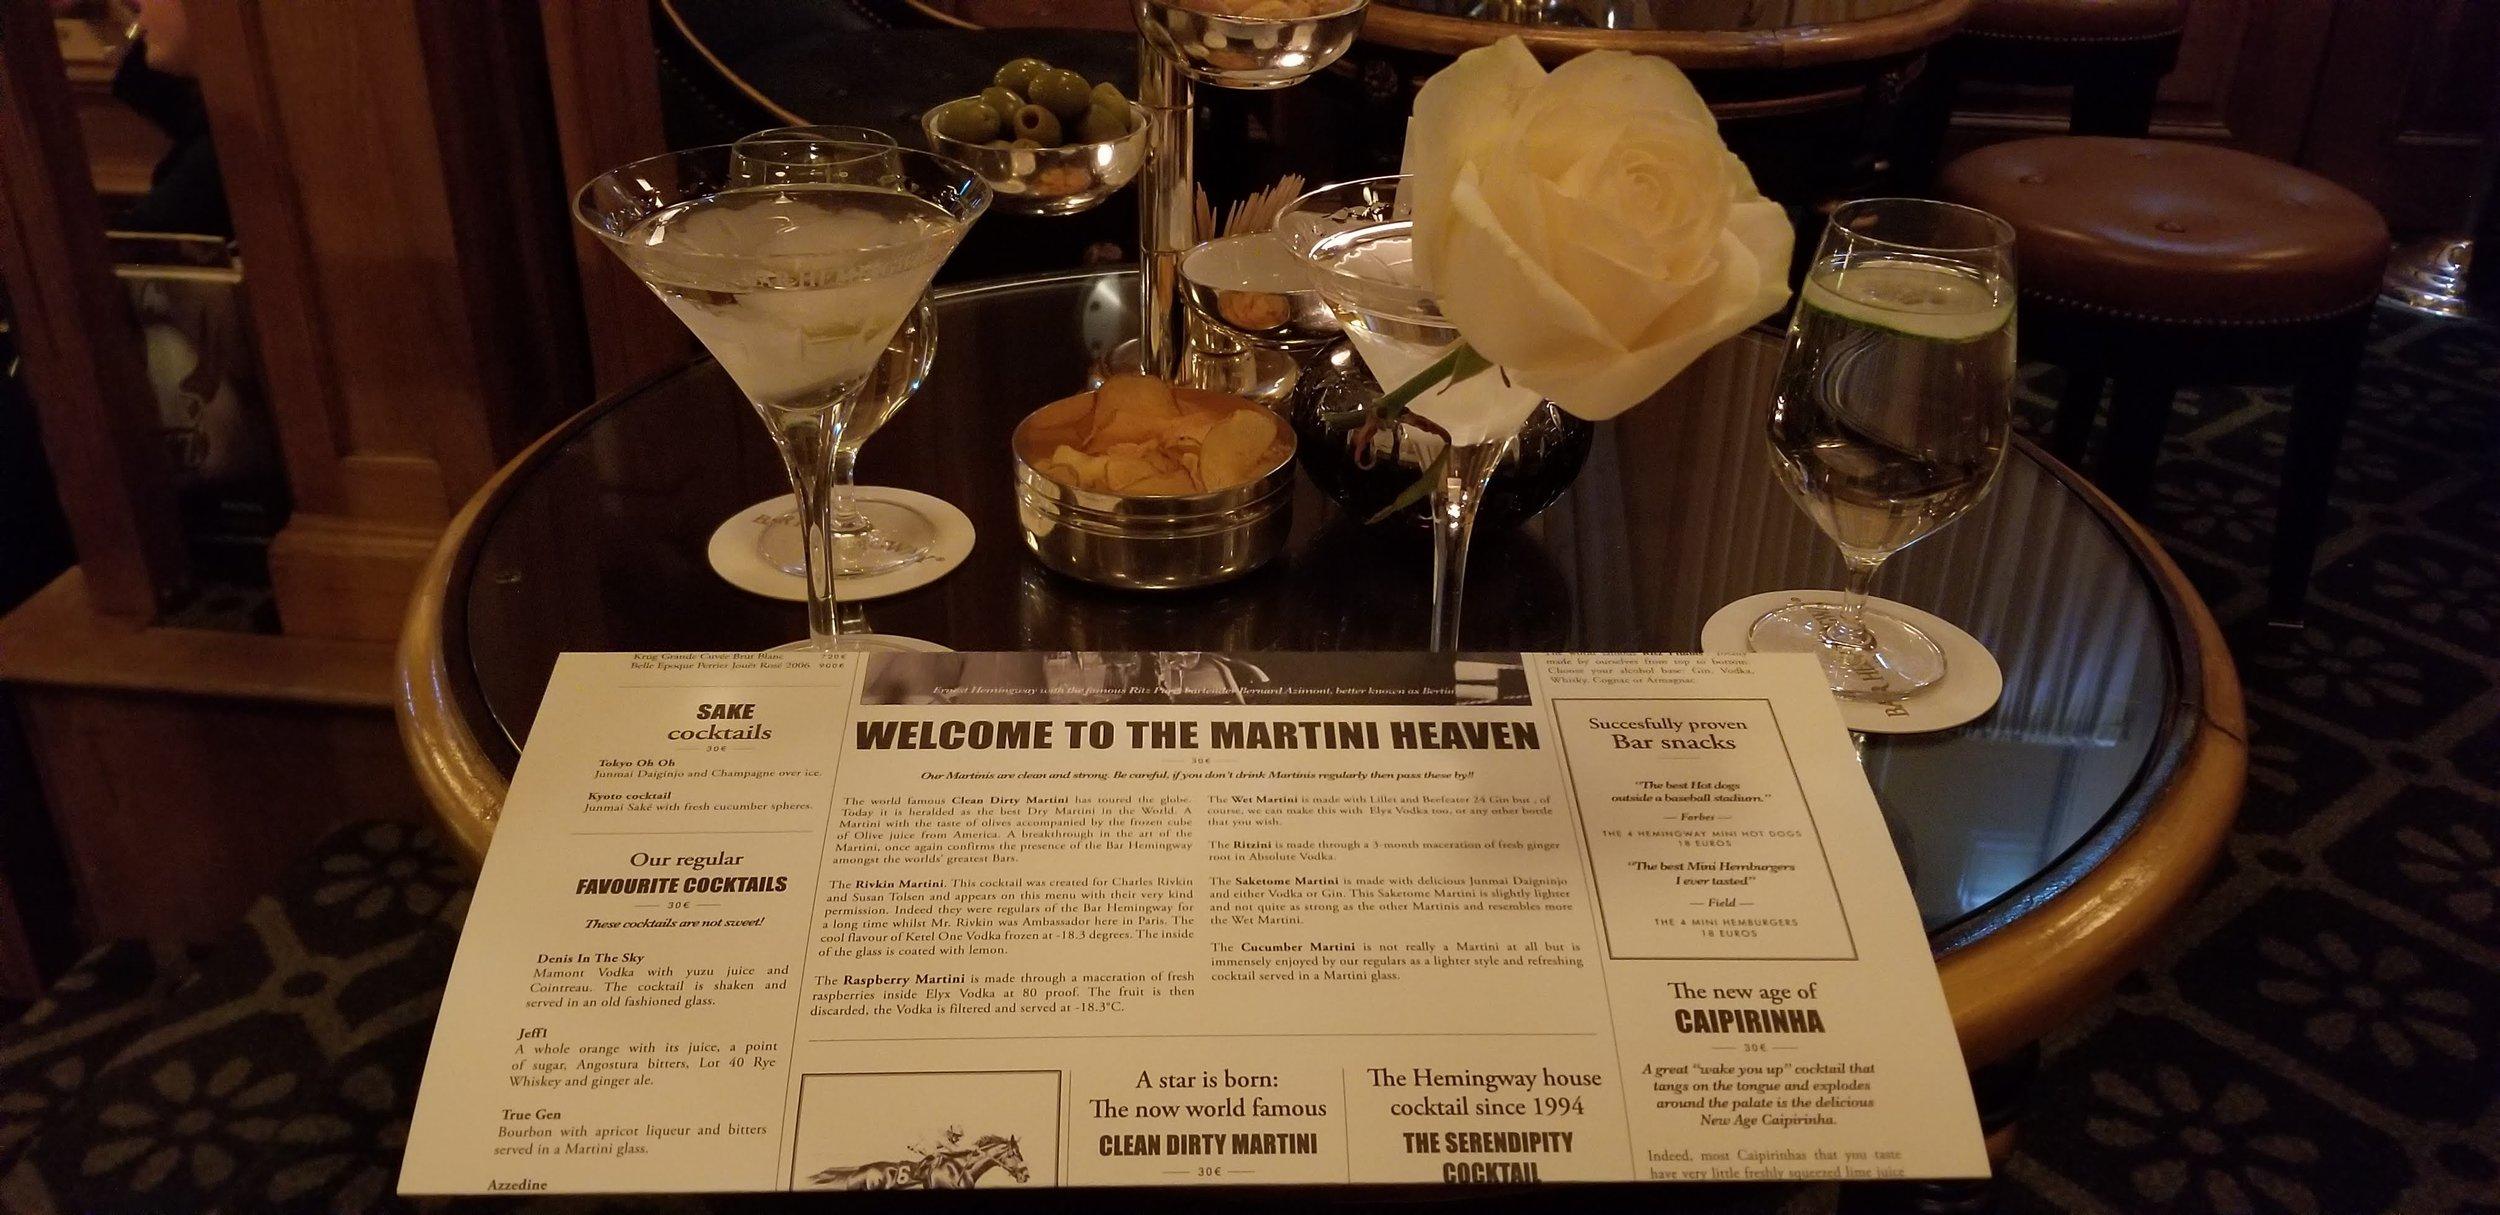 Martini Heaven @Hemingway Bar: The Rivkin & Clean Dirty Martini Reunitedco